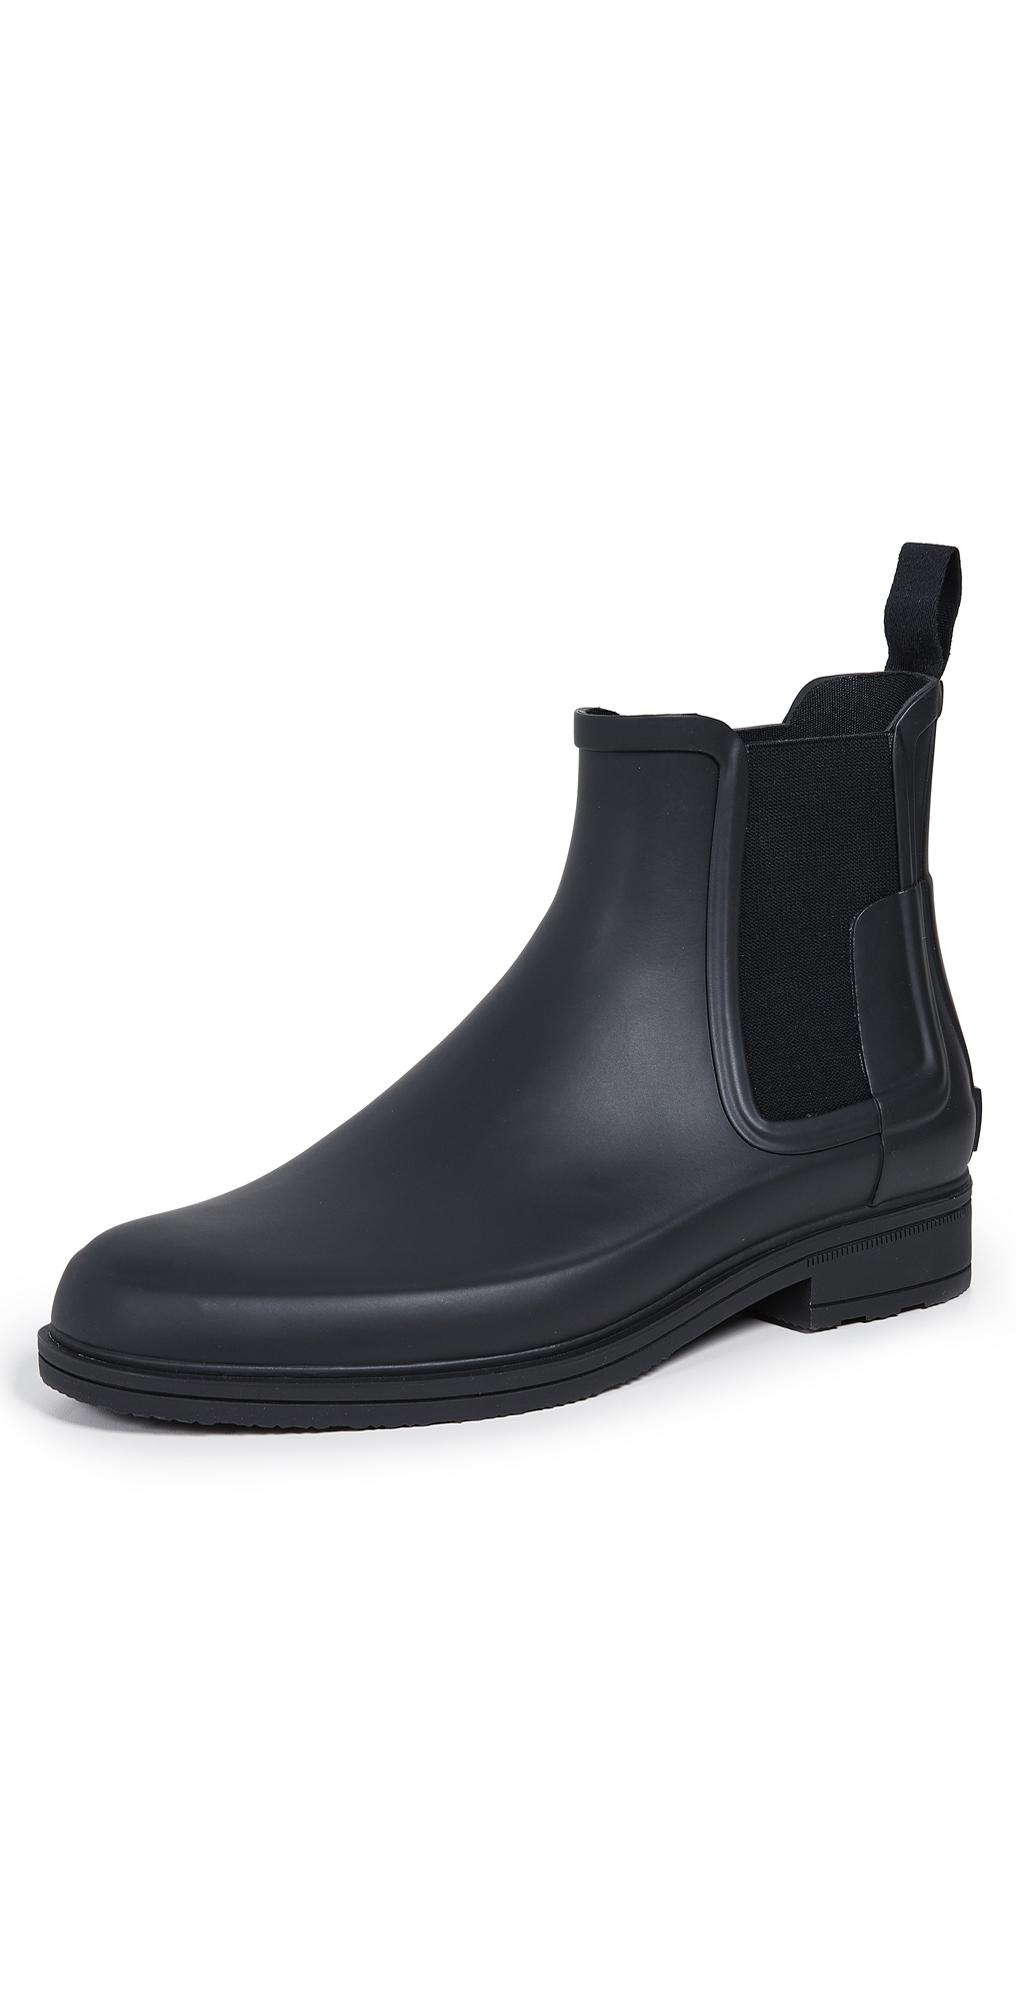 Original Refined Chelsea Boots